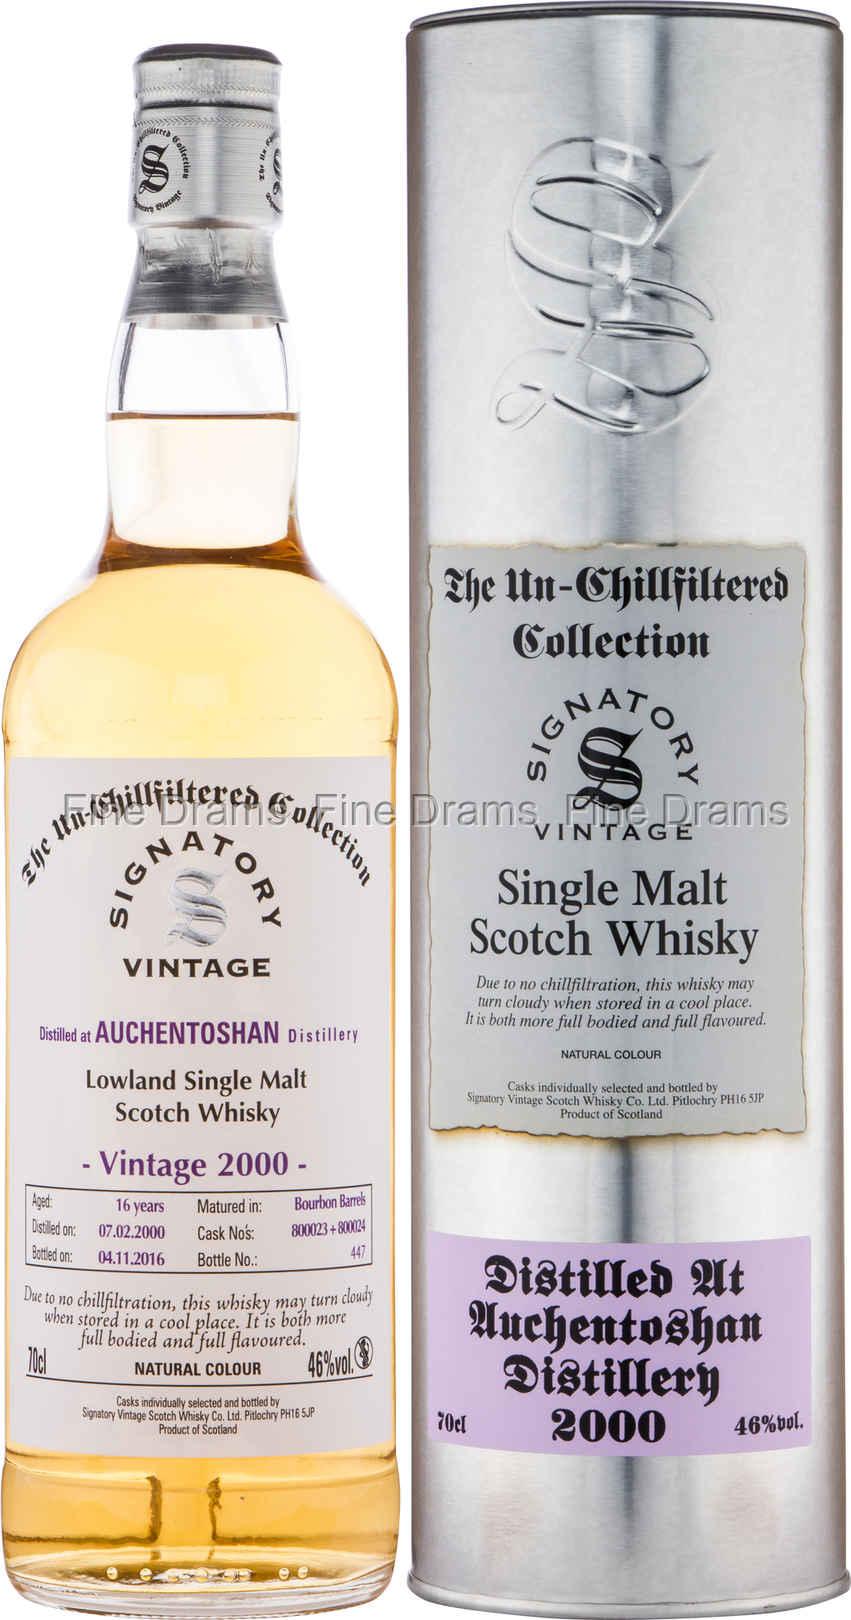 Auchentoshan 16 Year Old 2000 Whisky Cask 800023